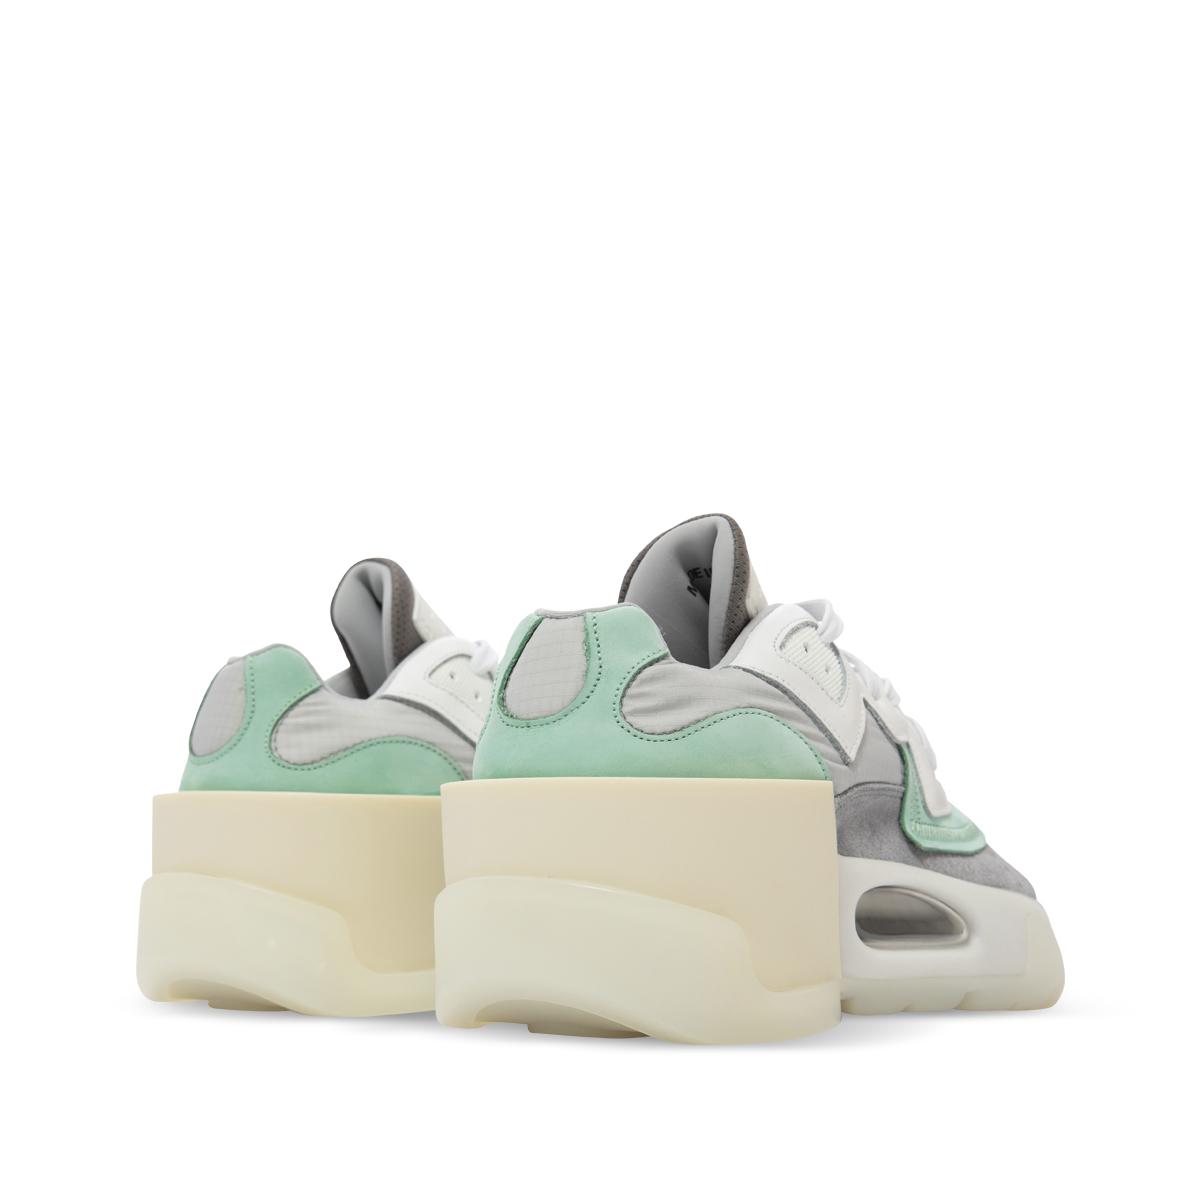 MM6 Maison Margiela Nuova Sneaker